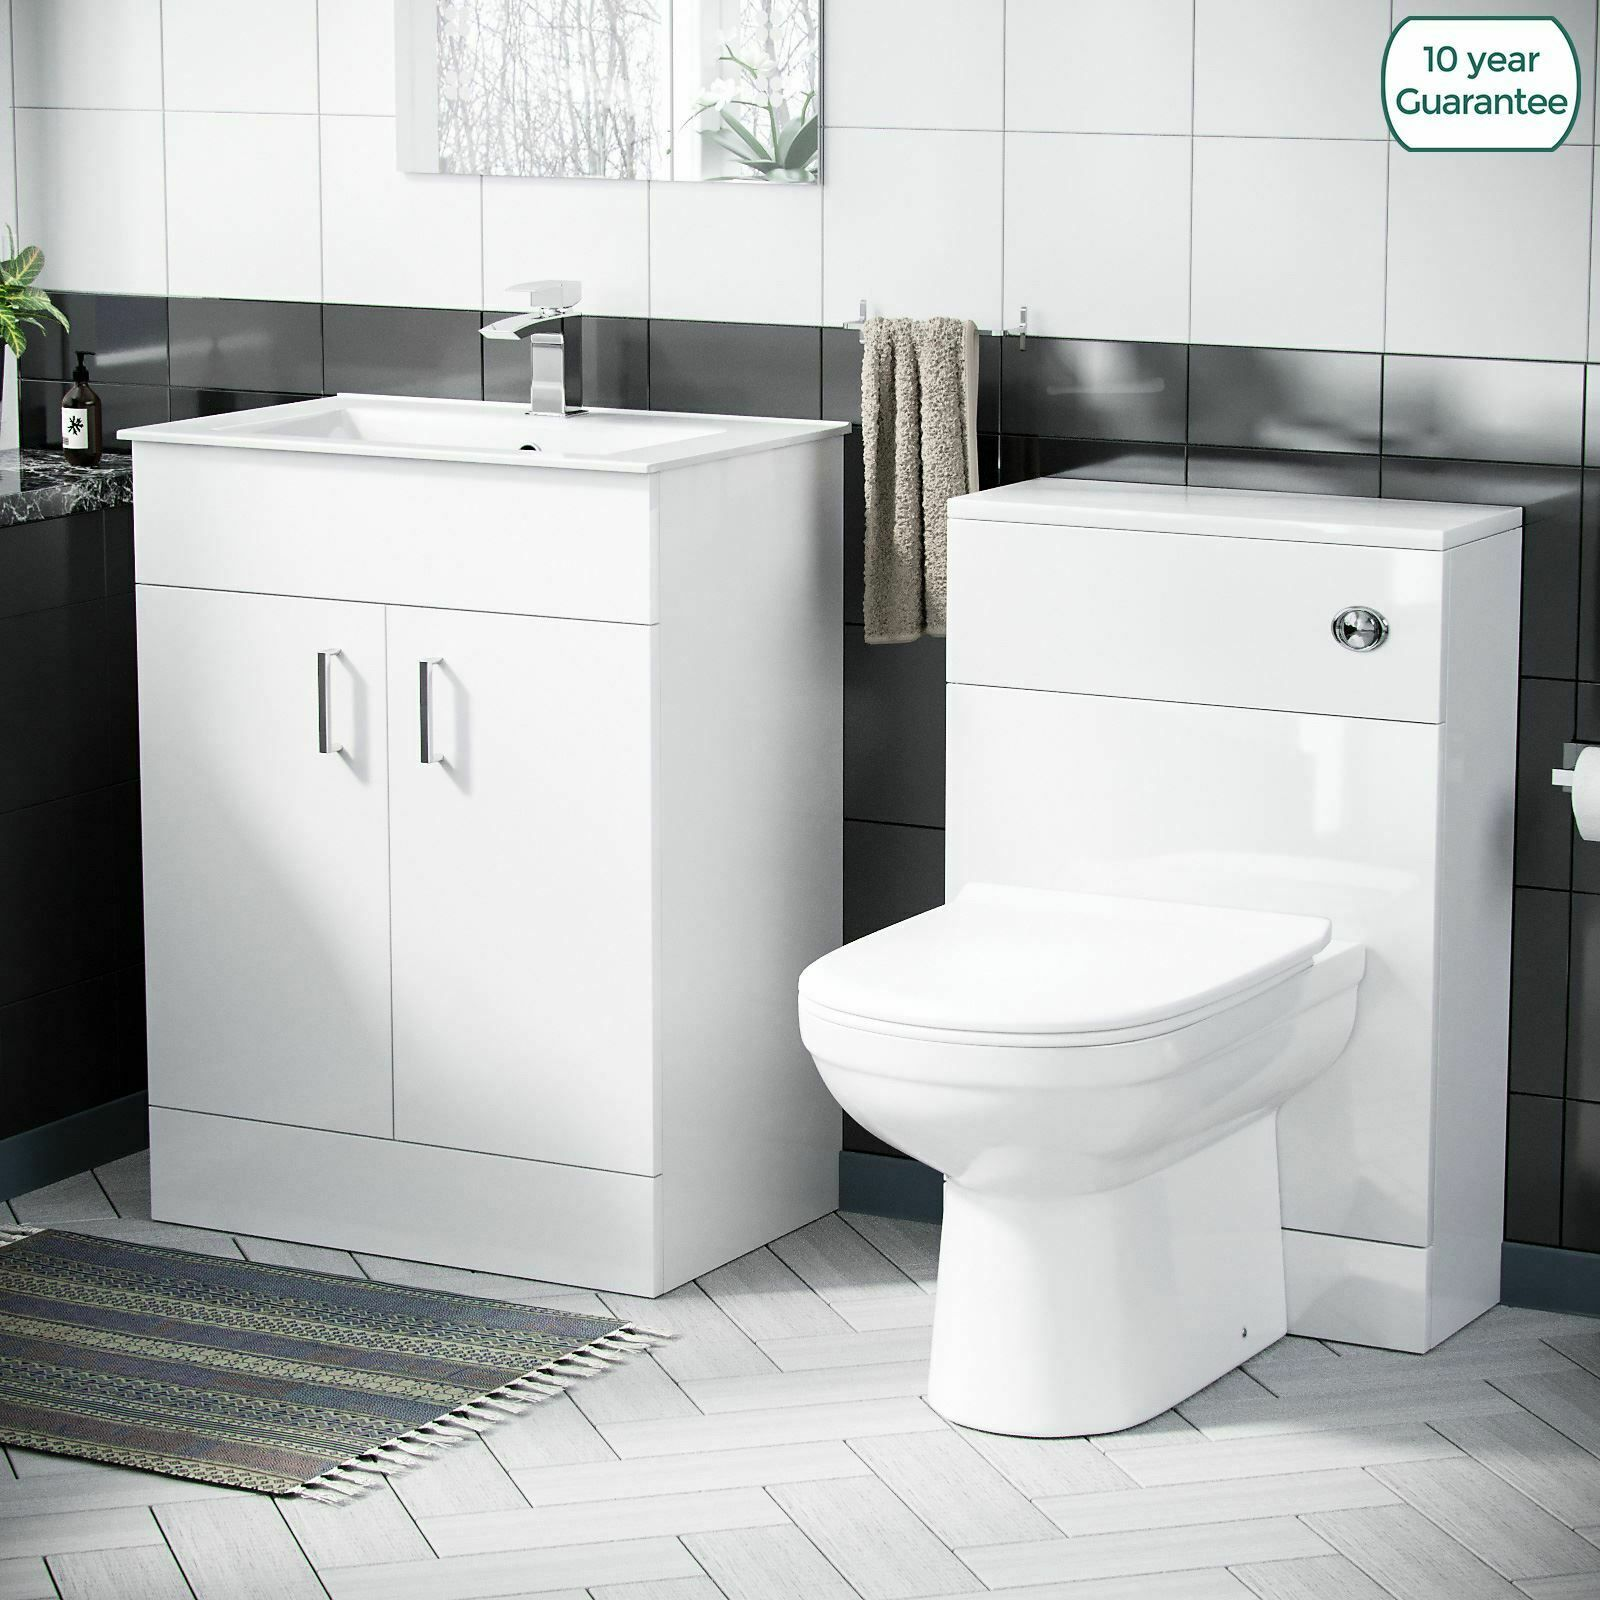 Toilet Bidet Combination in 2020 Toilet, Bidet, Sink